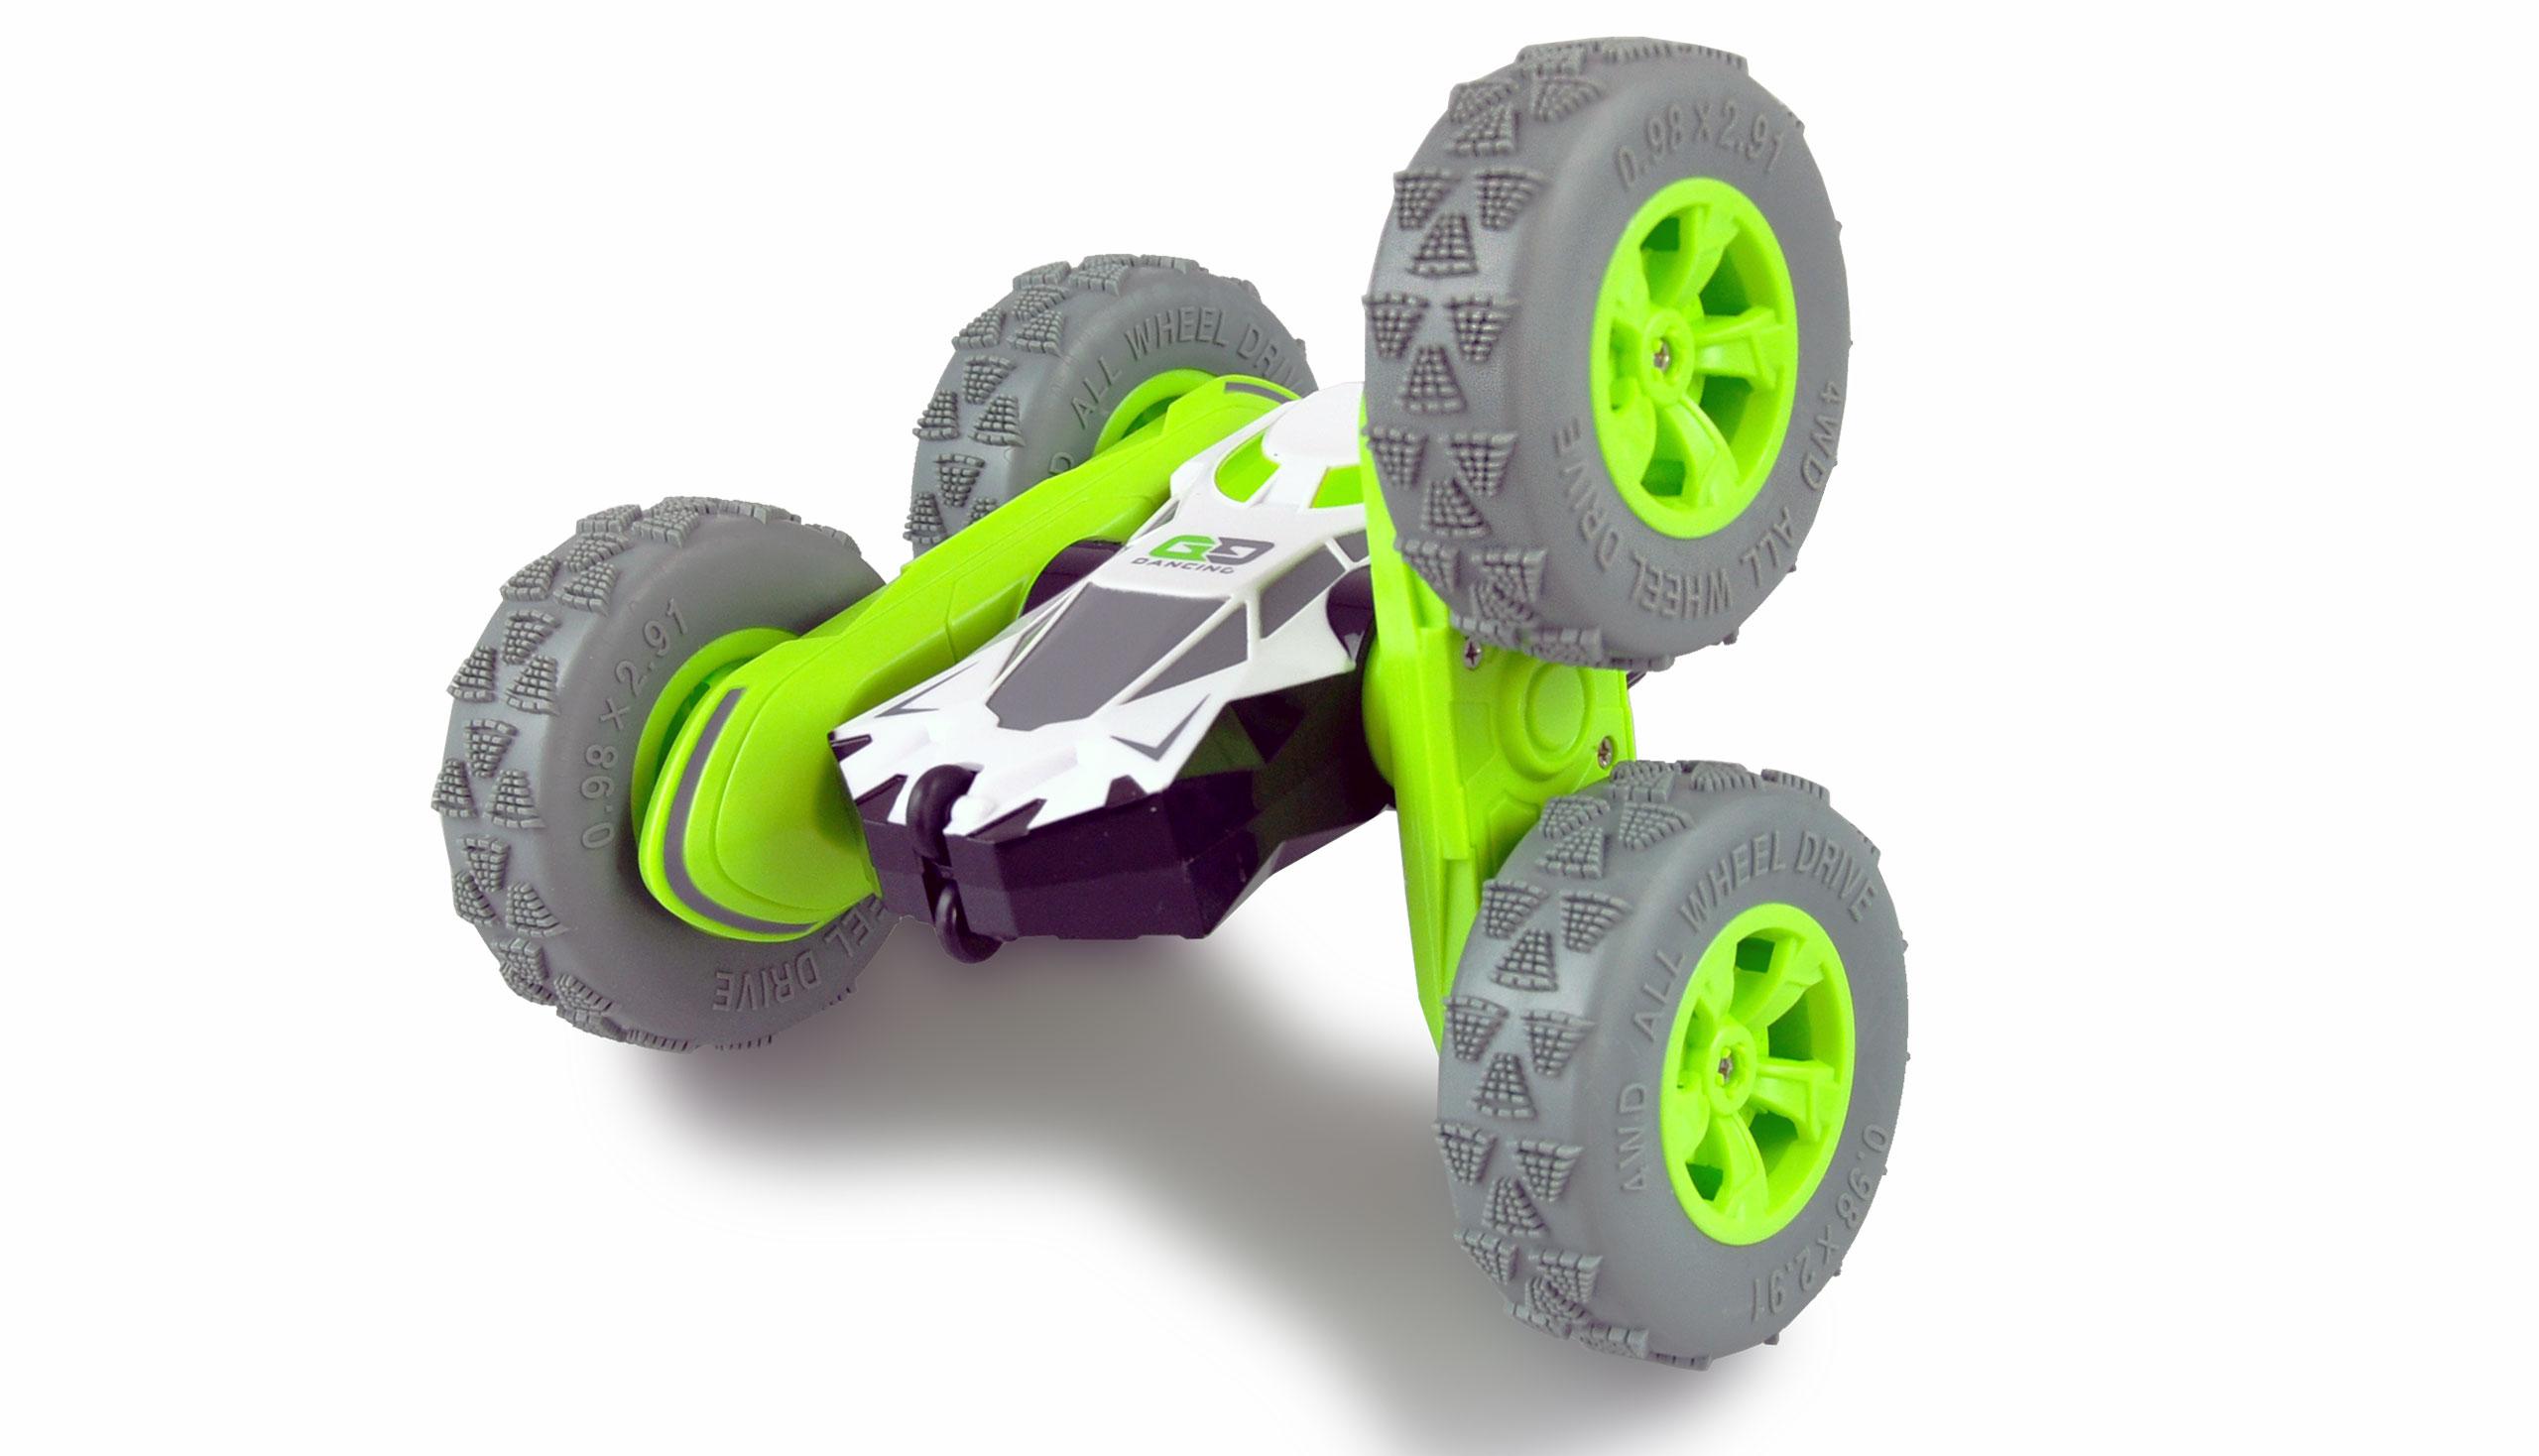 Big SpinStar, oboustranné auto, 4WD, otočné nápravy, 2,4 GHz, 100% RTR, zelený